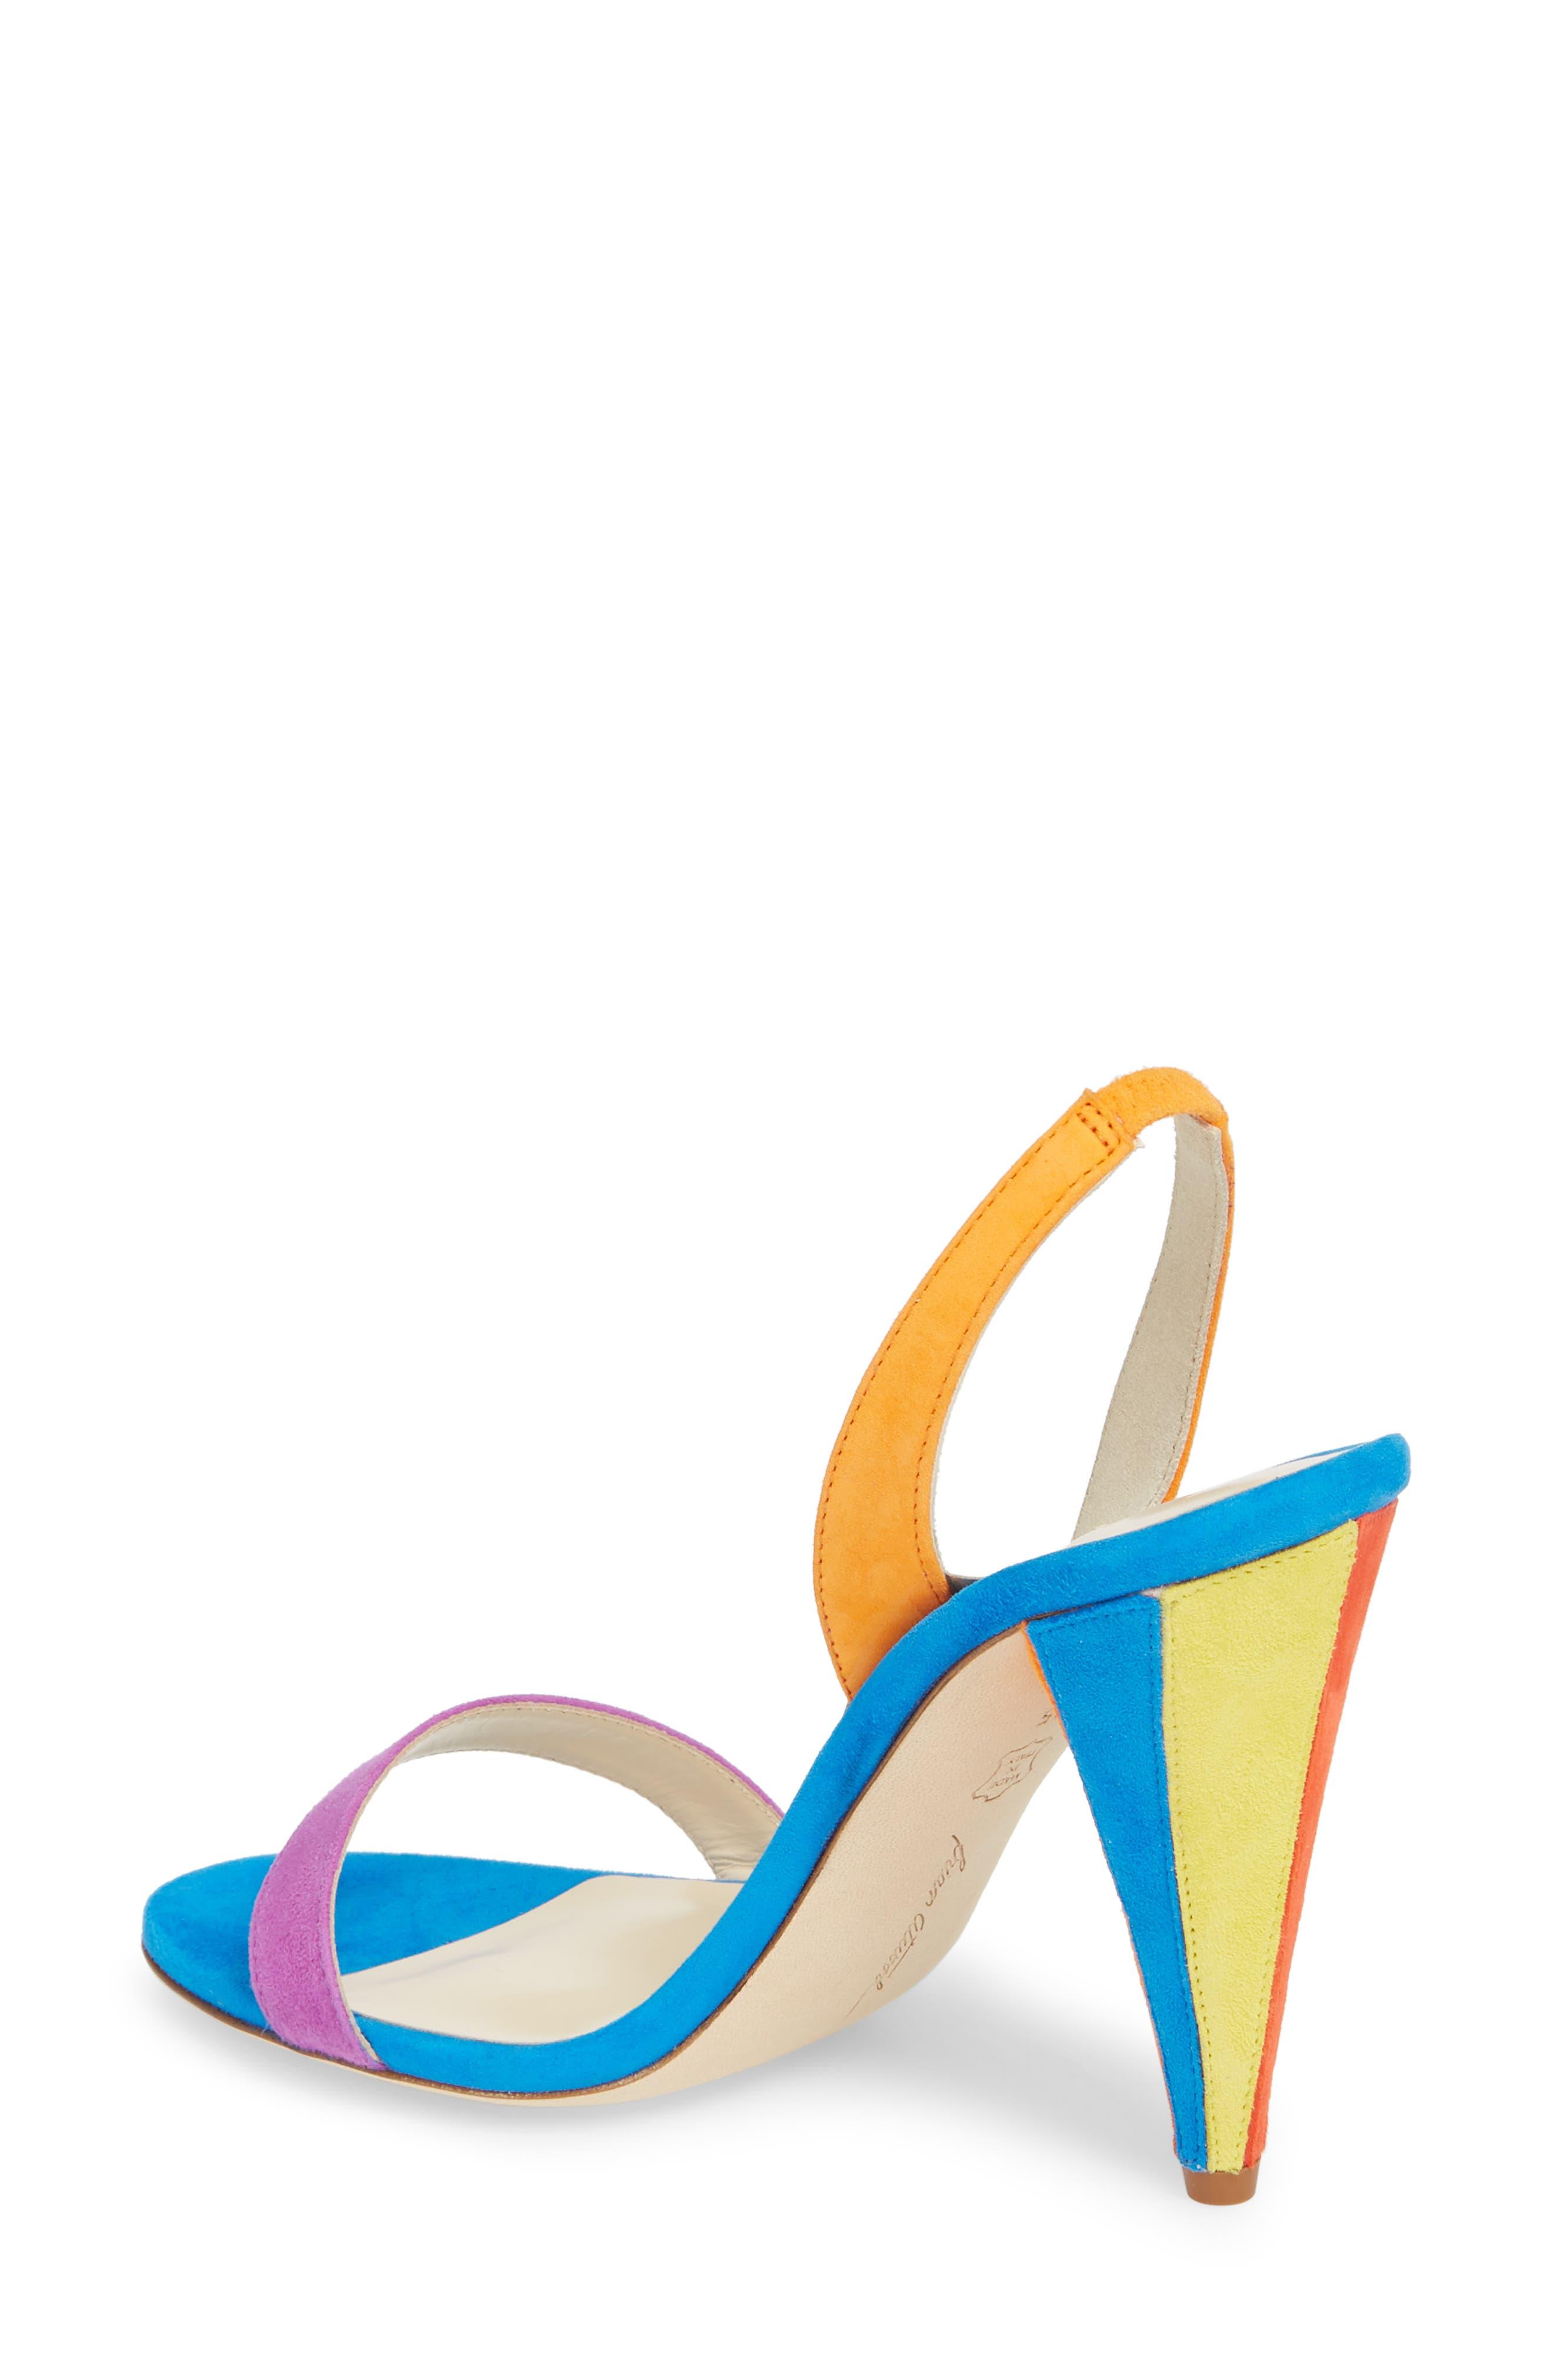 Susii Cone Heel Sandal,                             Alternate thumbnail 2, color,                             400